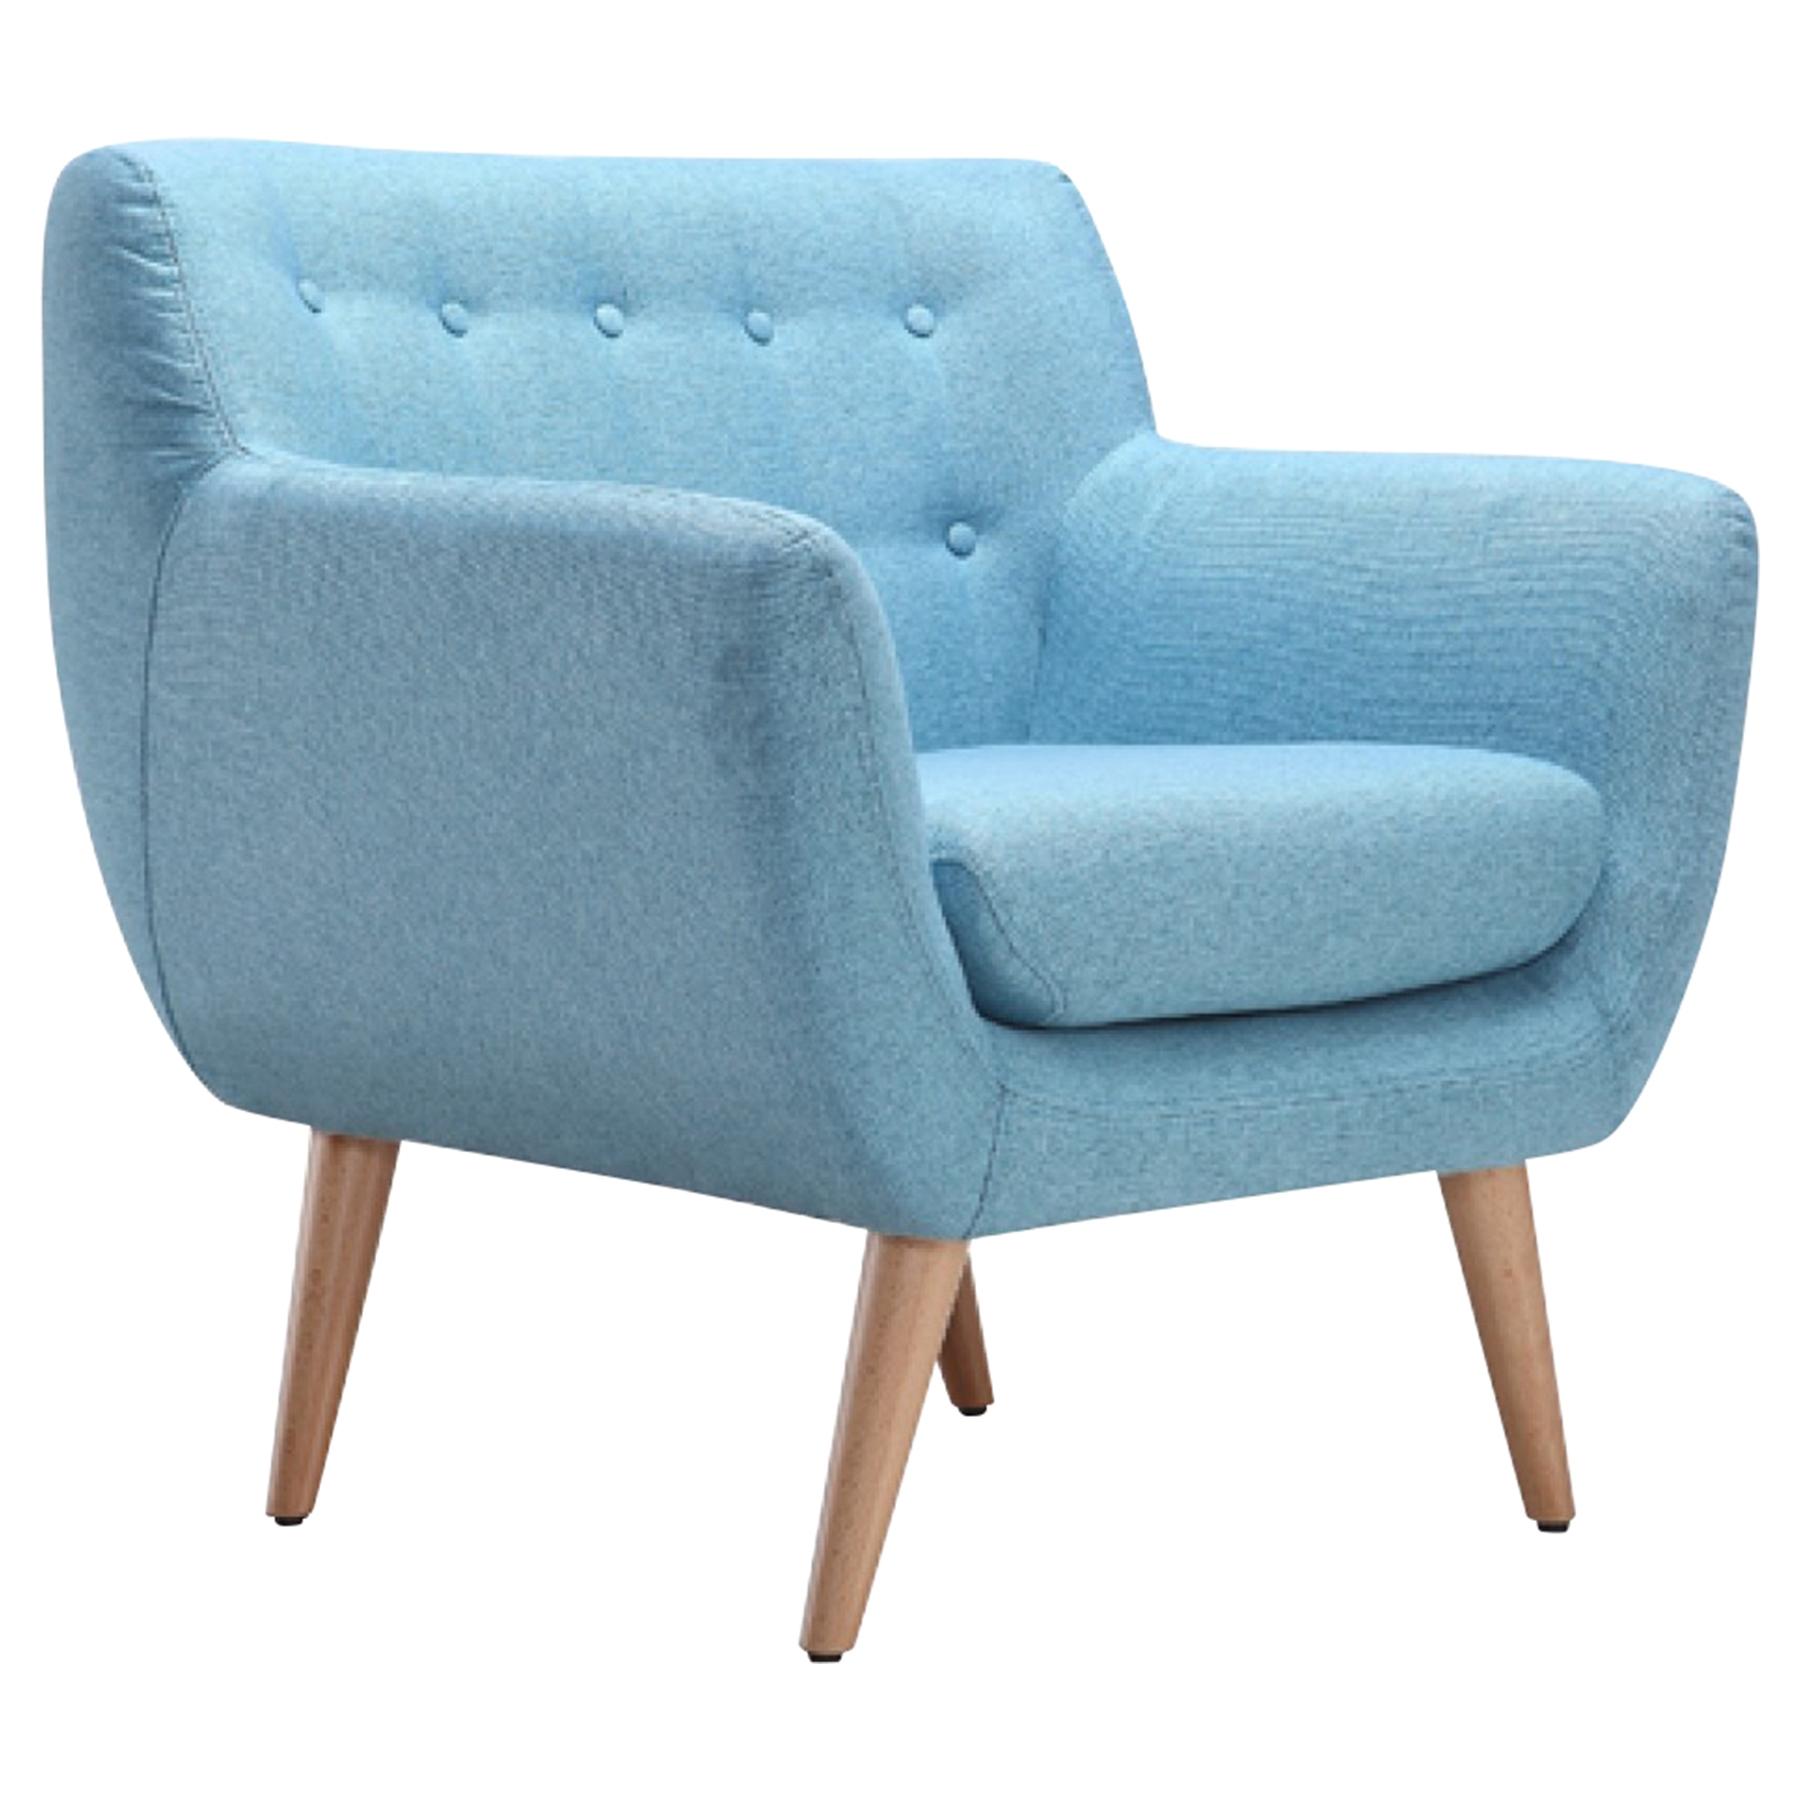 Divani Casa Albany Accent Chair   Blue   VIG VG2T0787 BLU ...